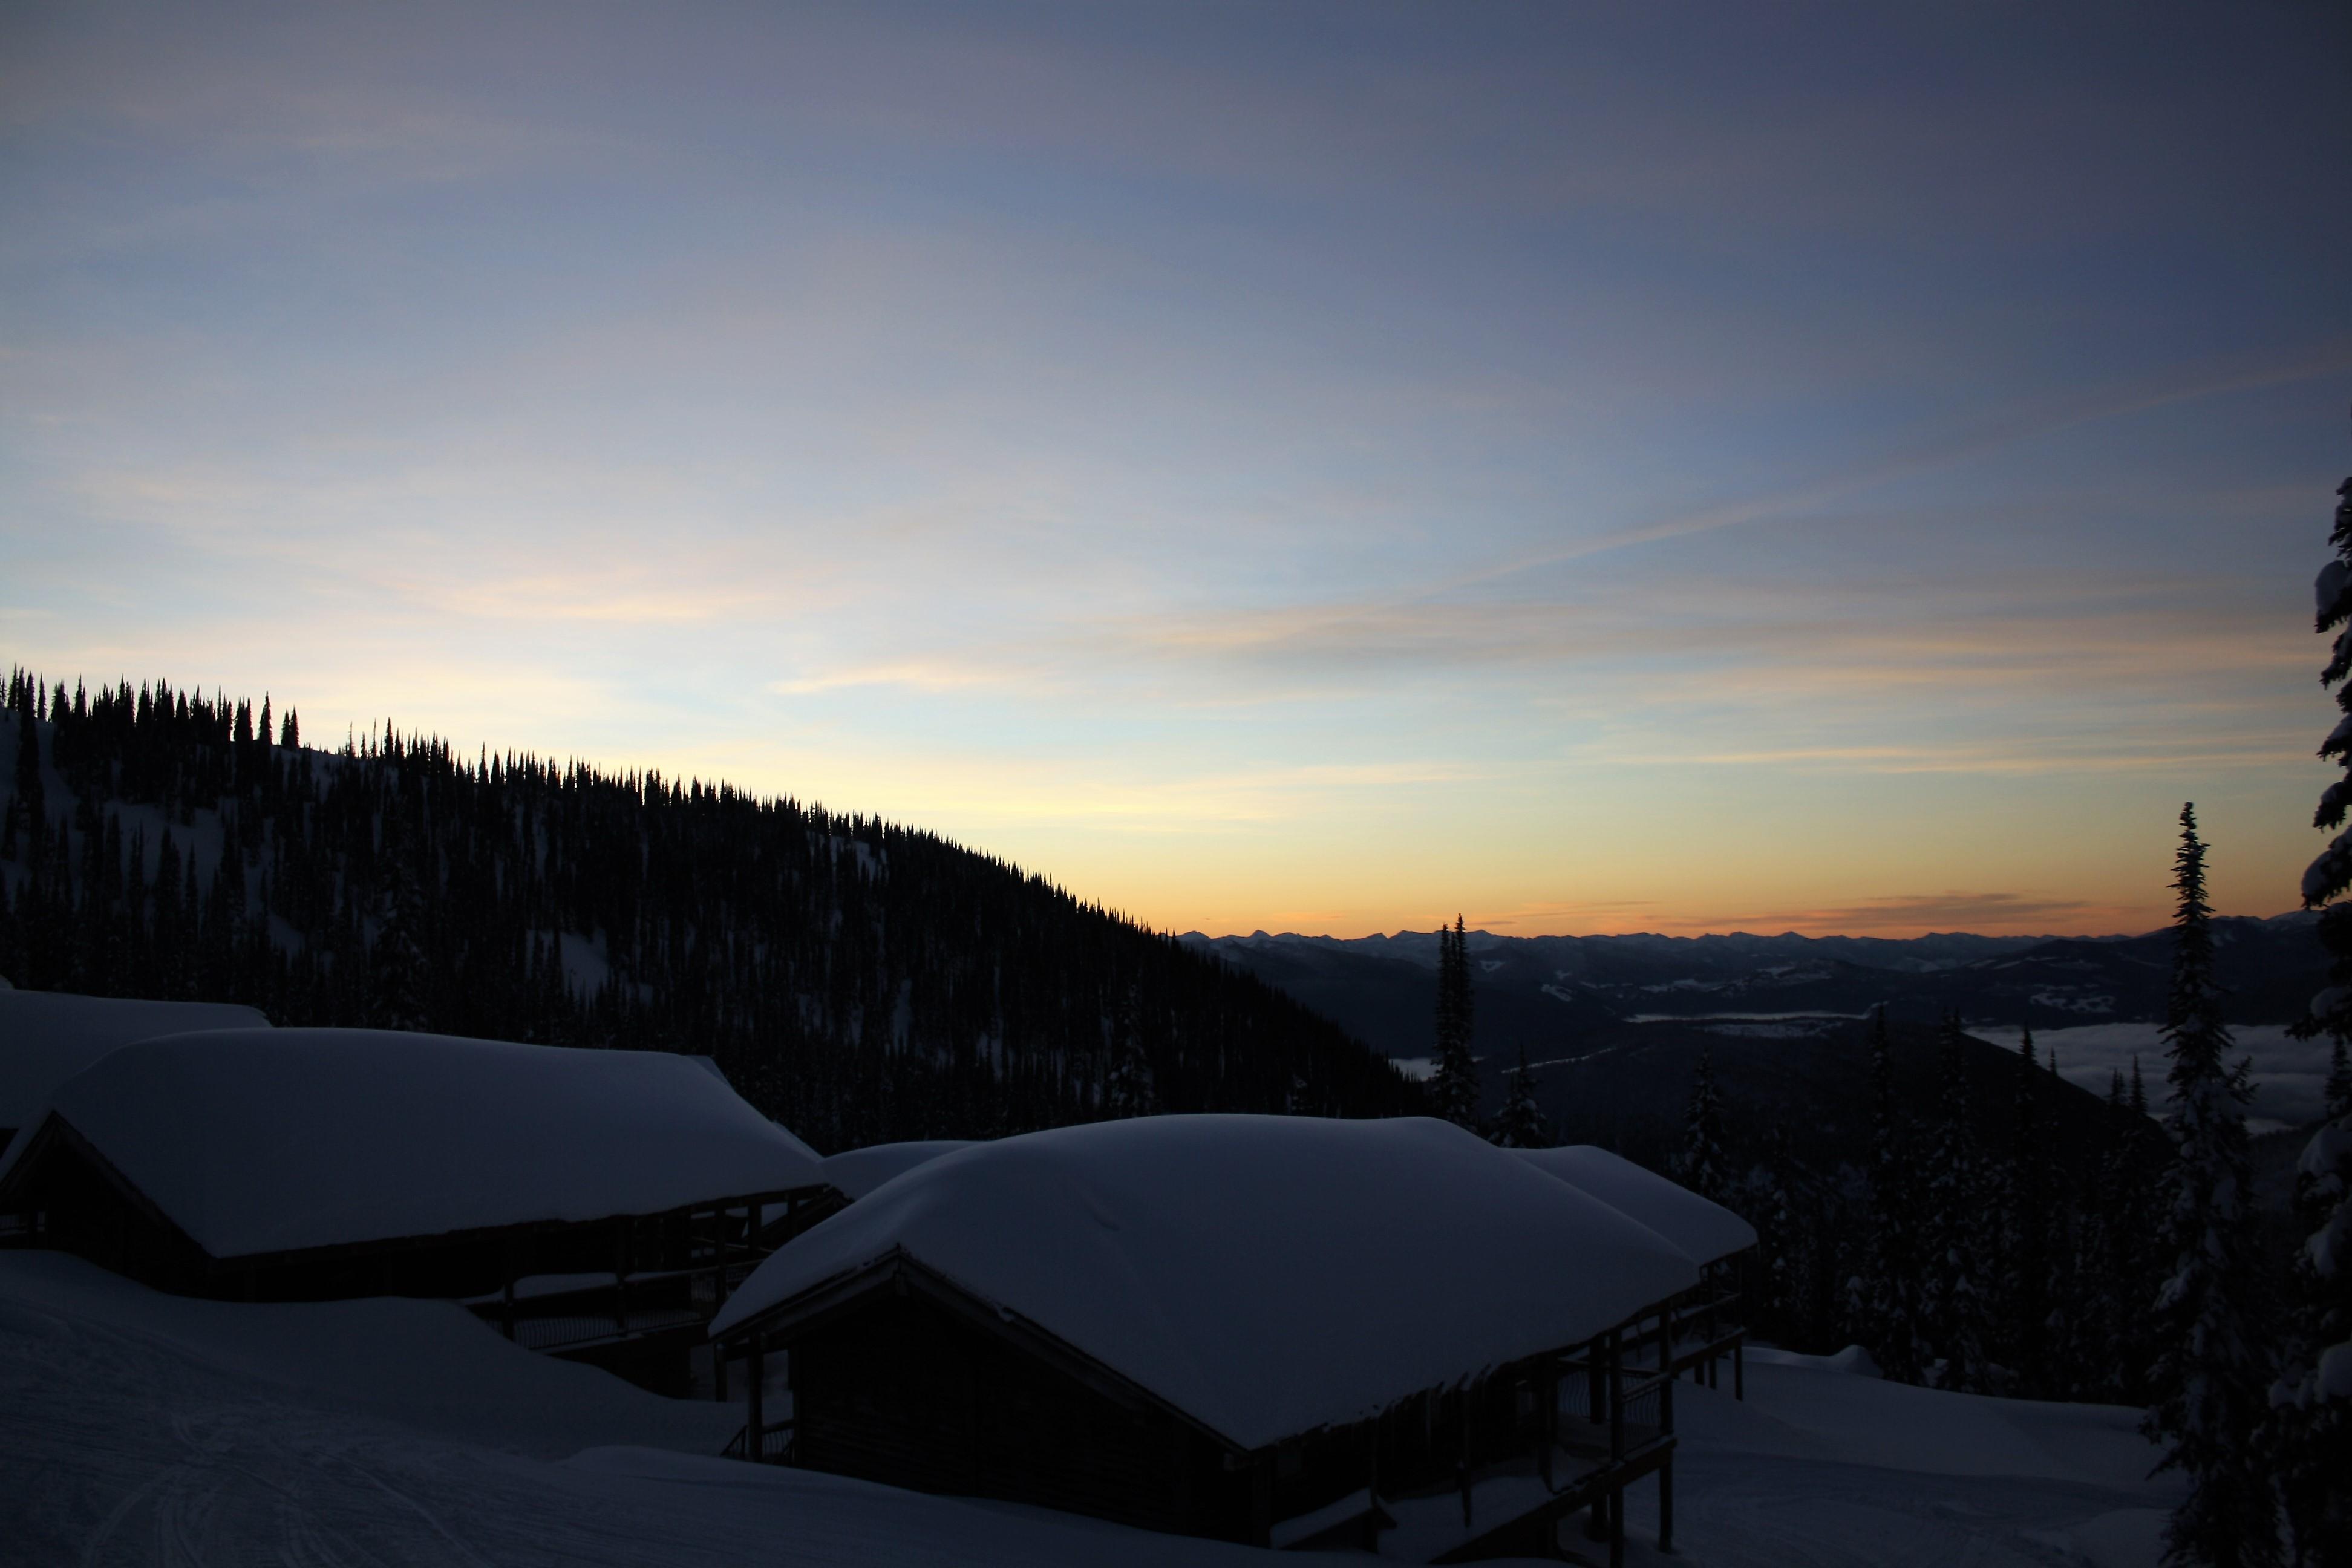 DM_nature_winter_kootenays_1733